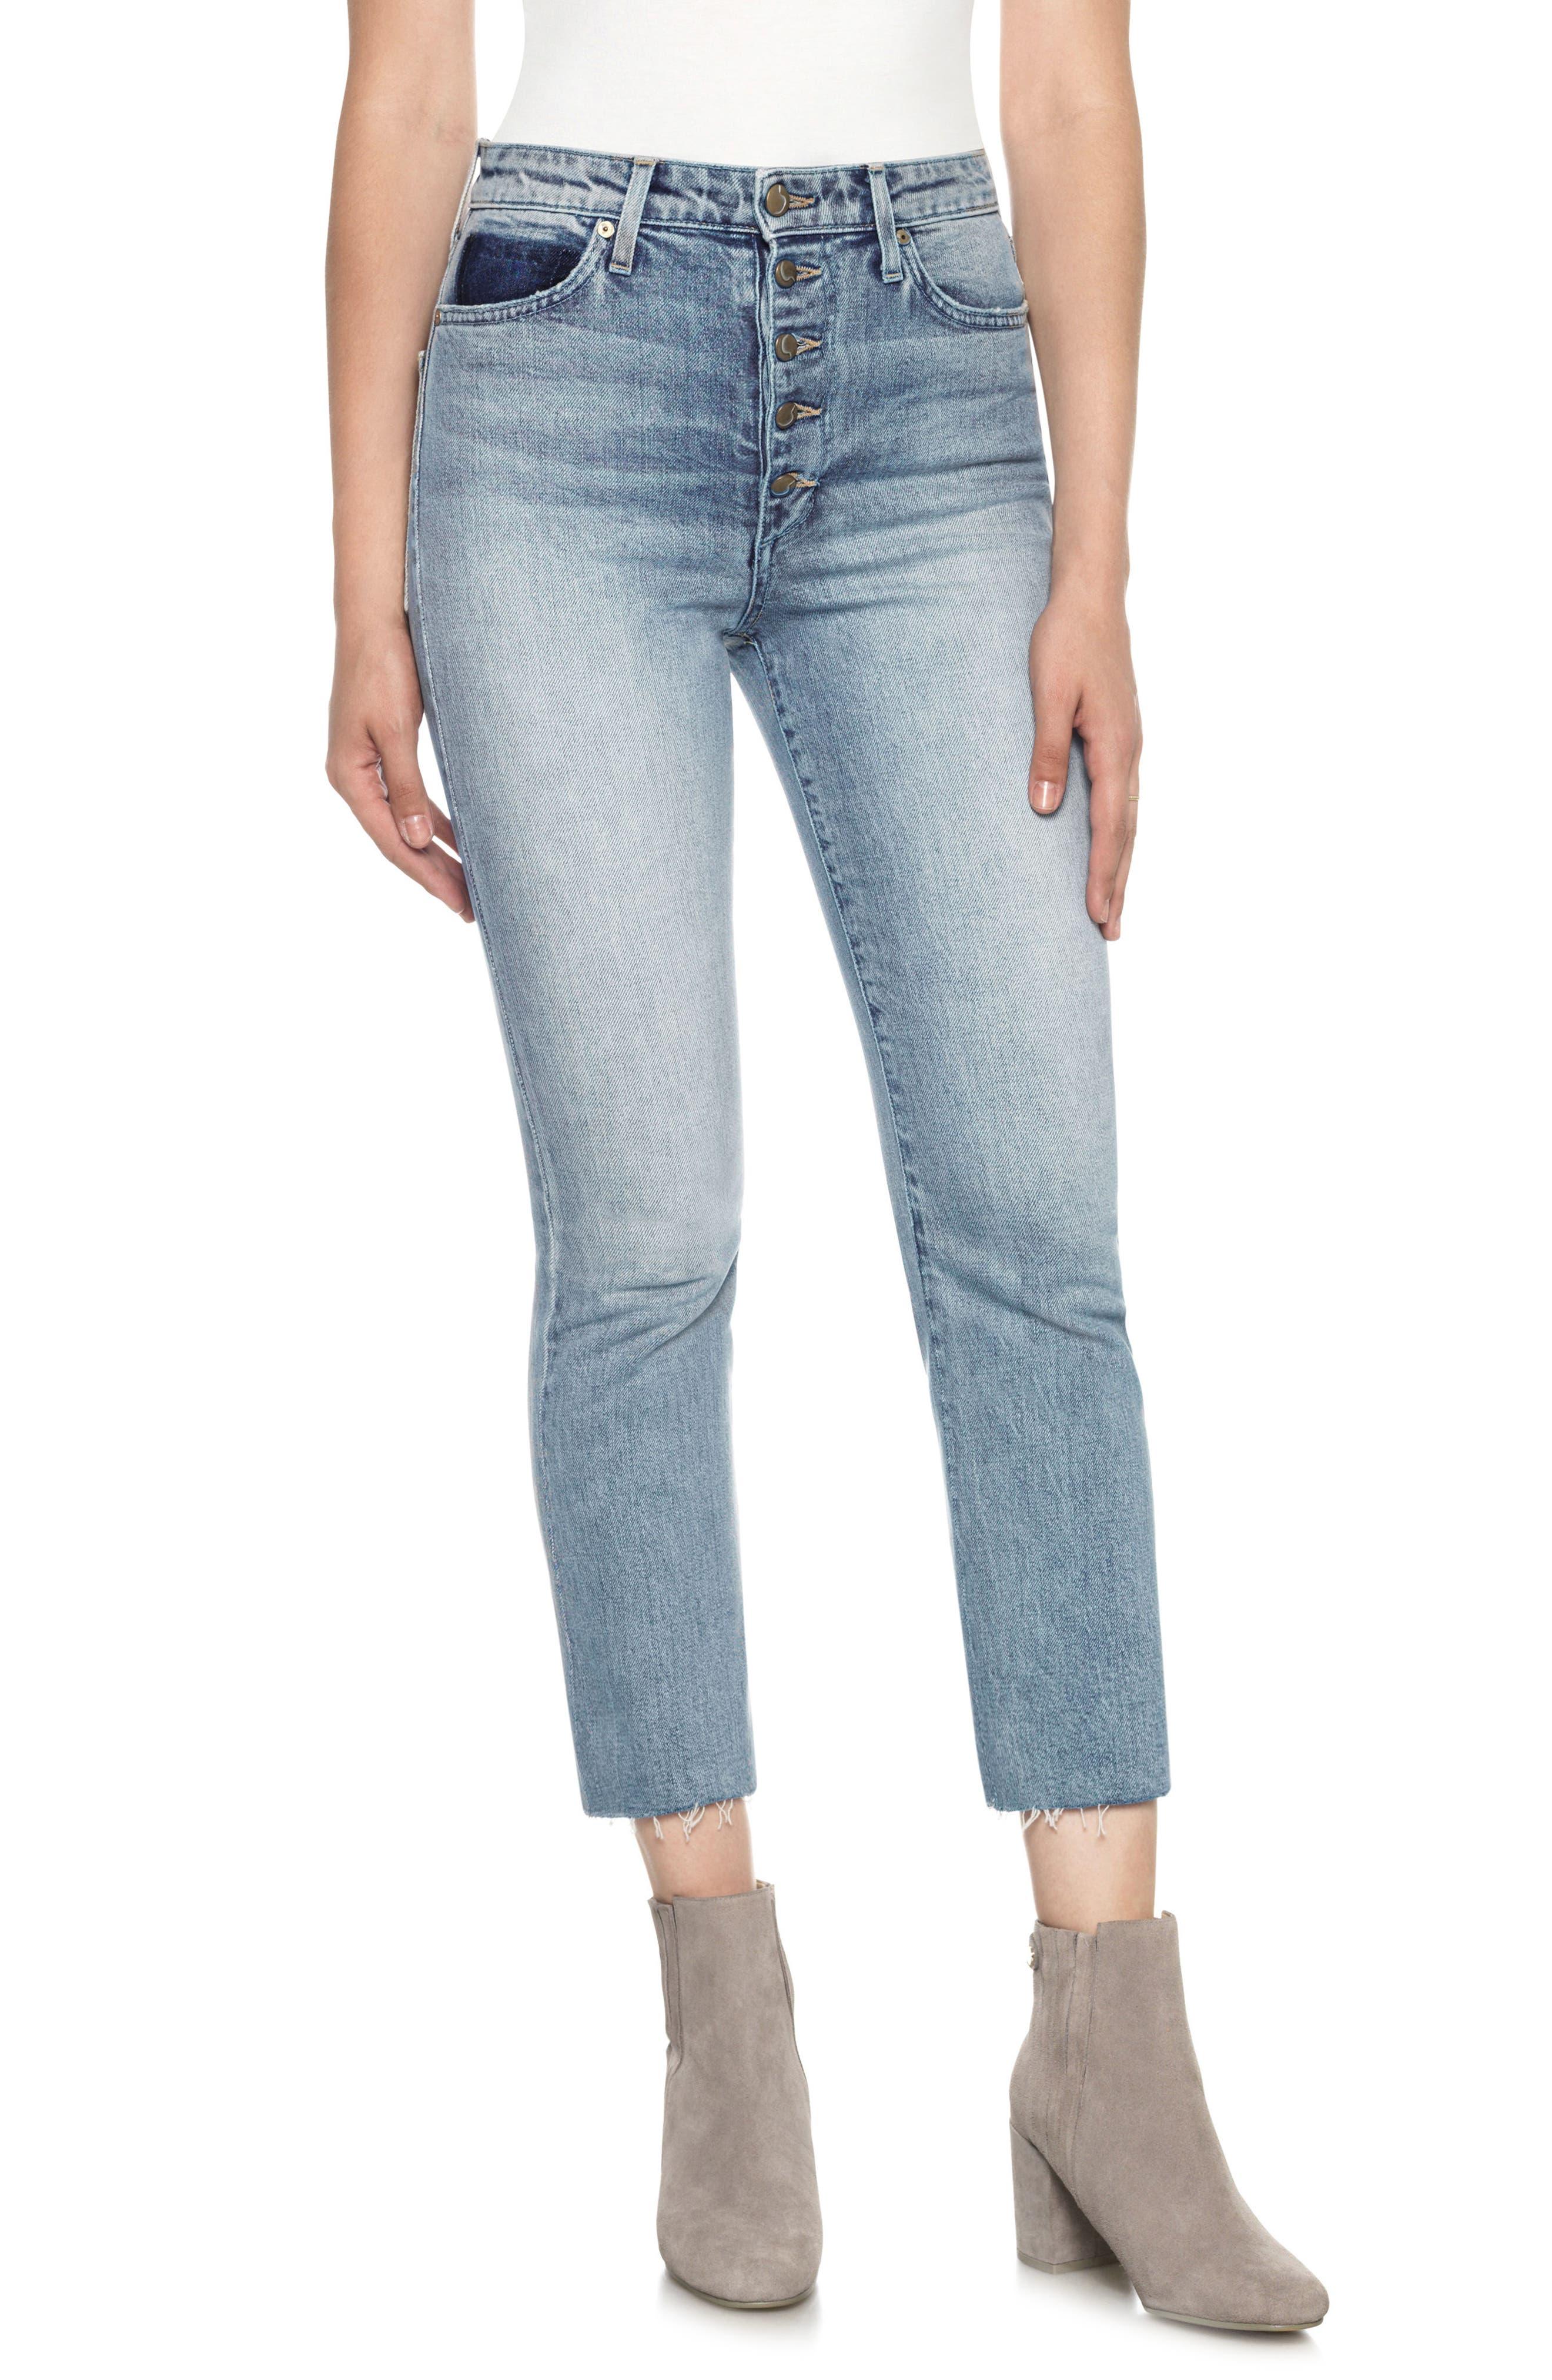 Debbie High Waist Crop Boyfriend Jeans,                             Main thumbnail 1, color,                             411